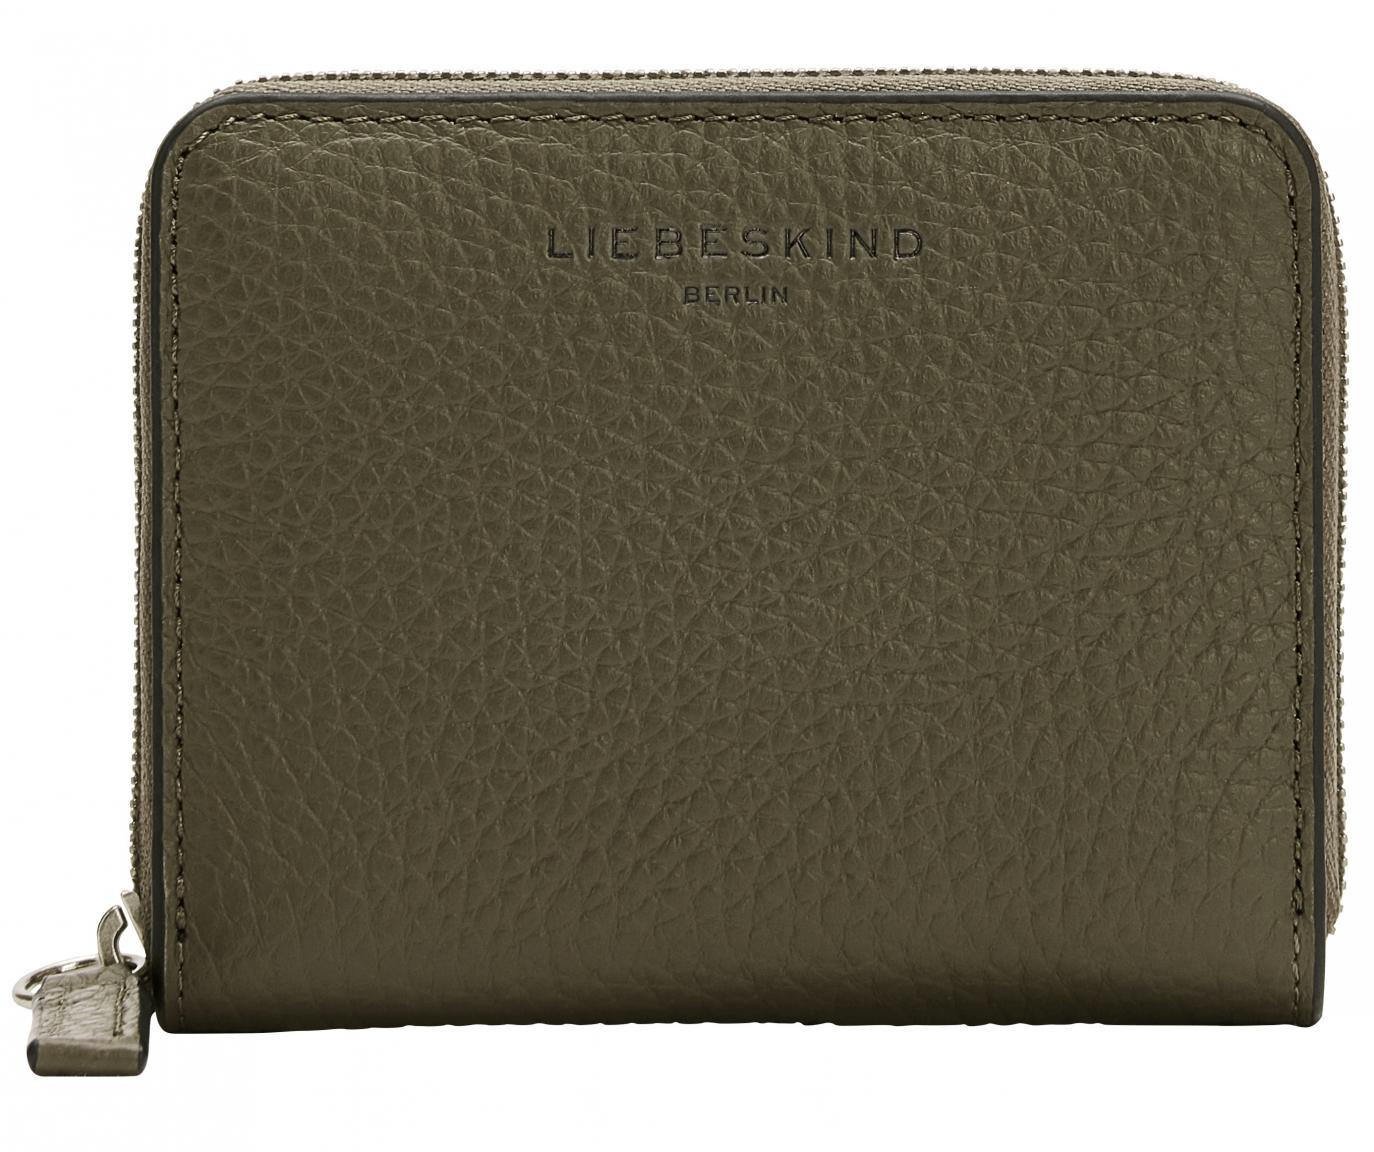 Zipbörse Liebeskind Helen Conny RFID-Schutz moosgrün Heavy Pebble genarbtes Leder